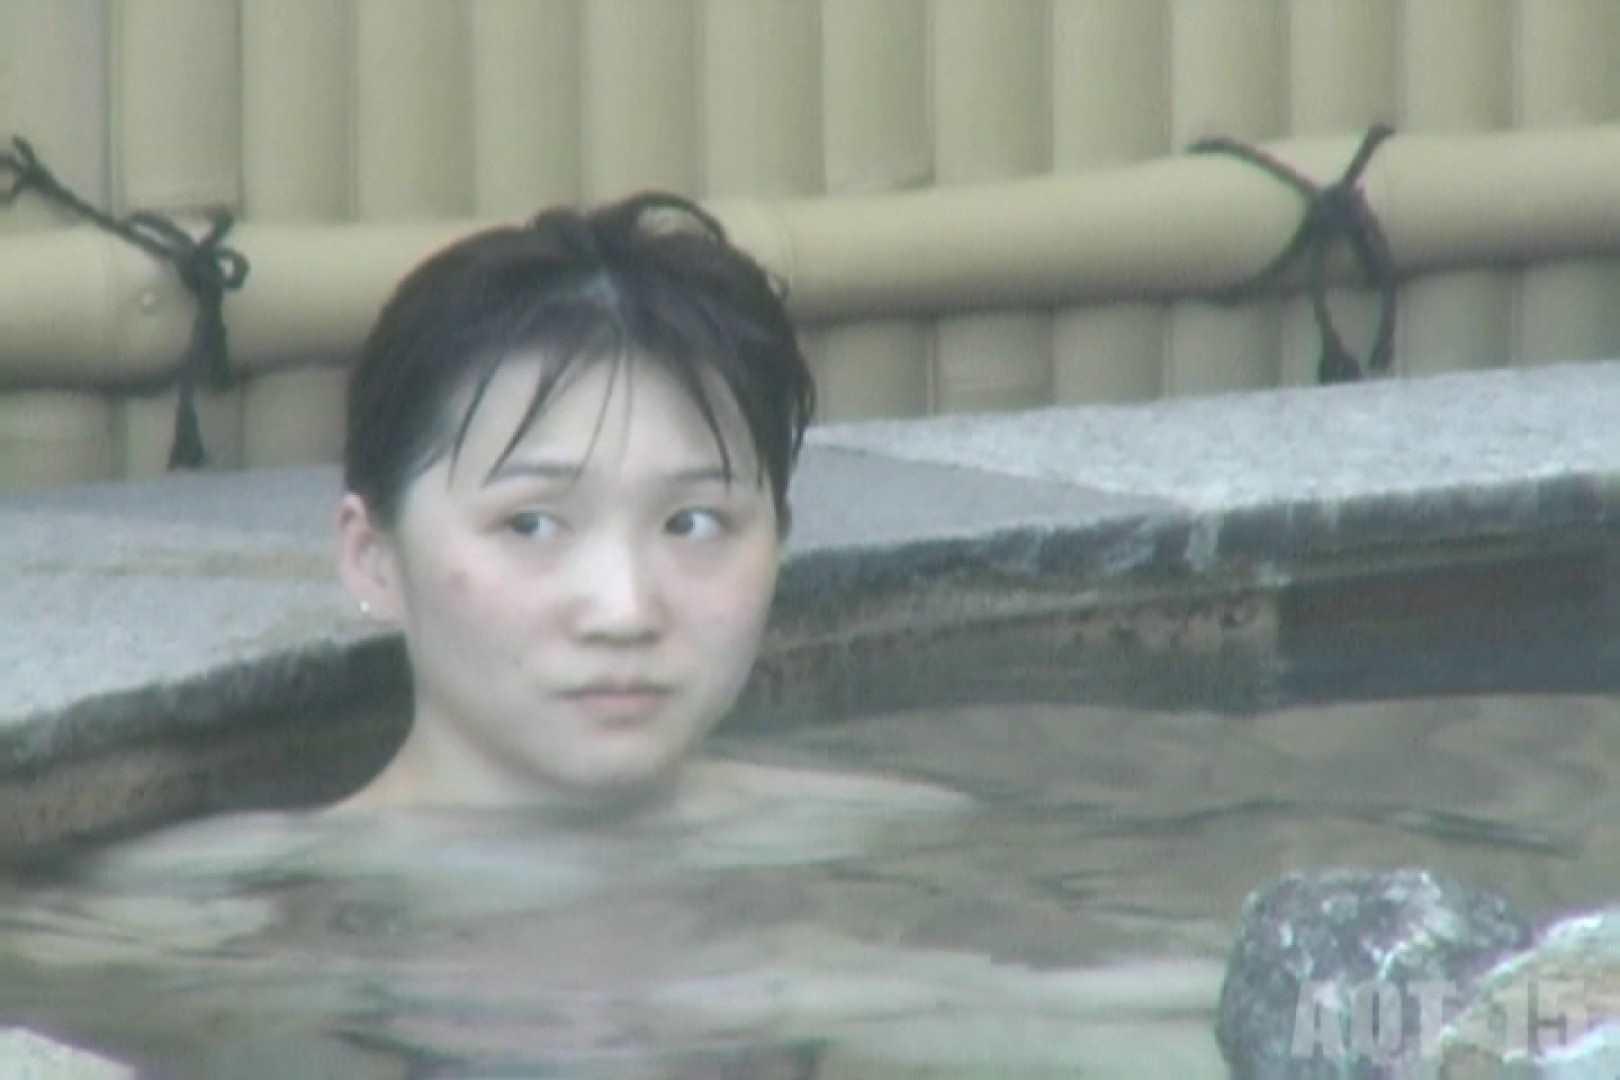 Aquaな露天風呂Vol.831 露天   HなOL  99pic 80